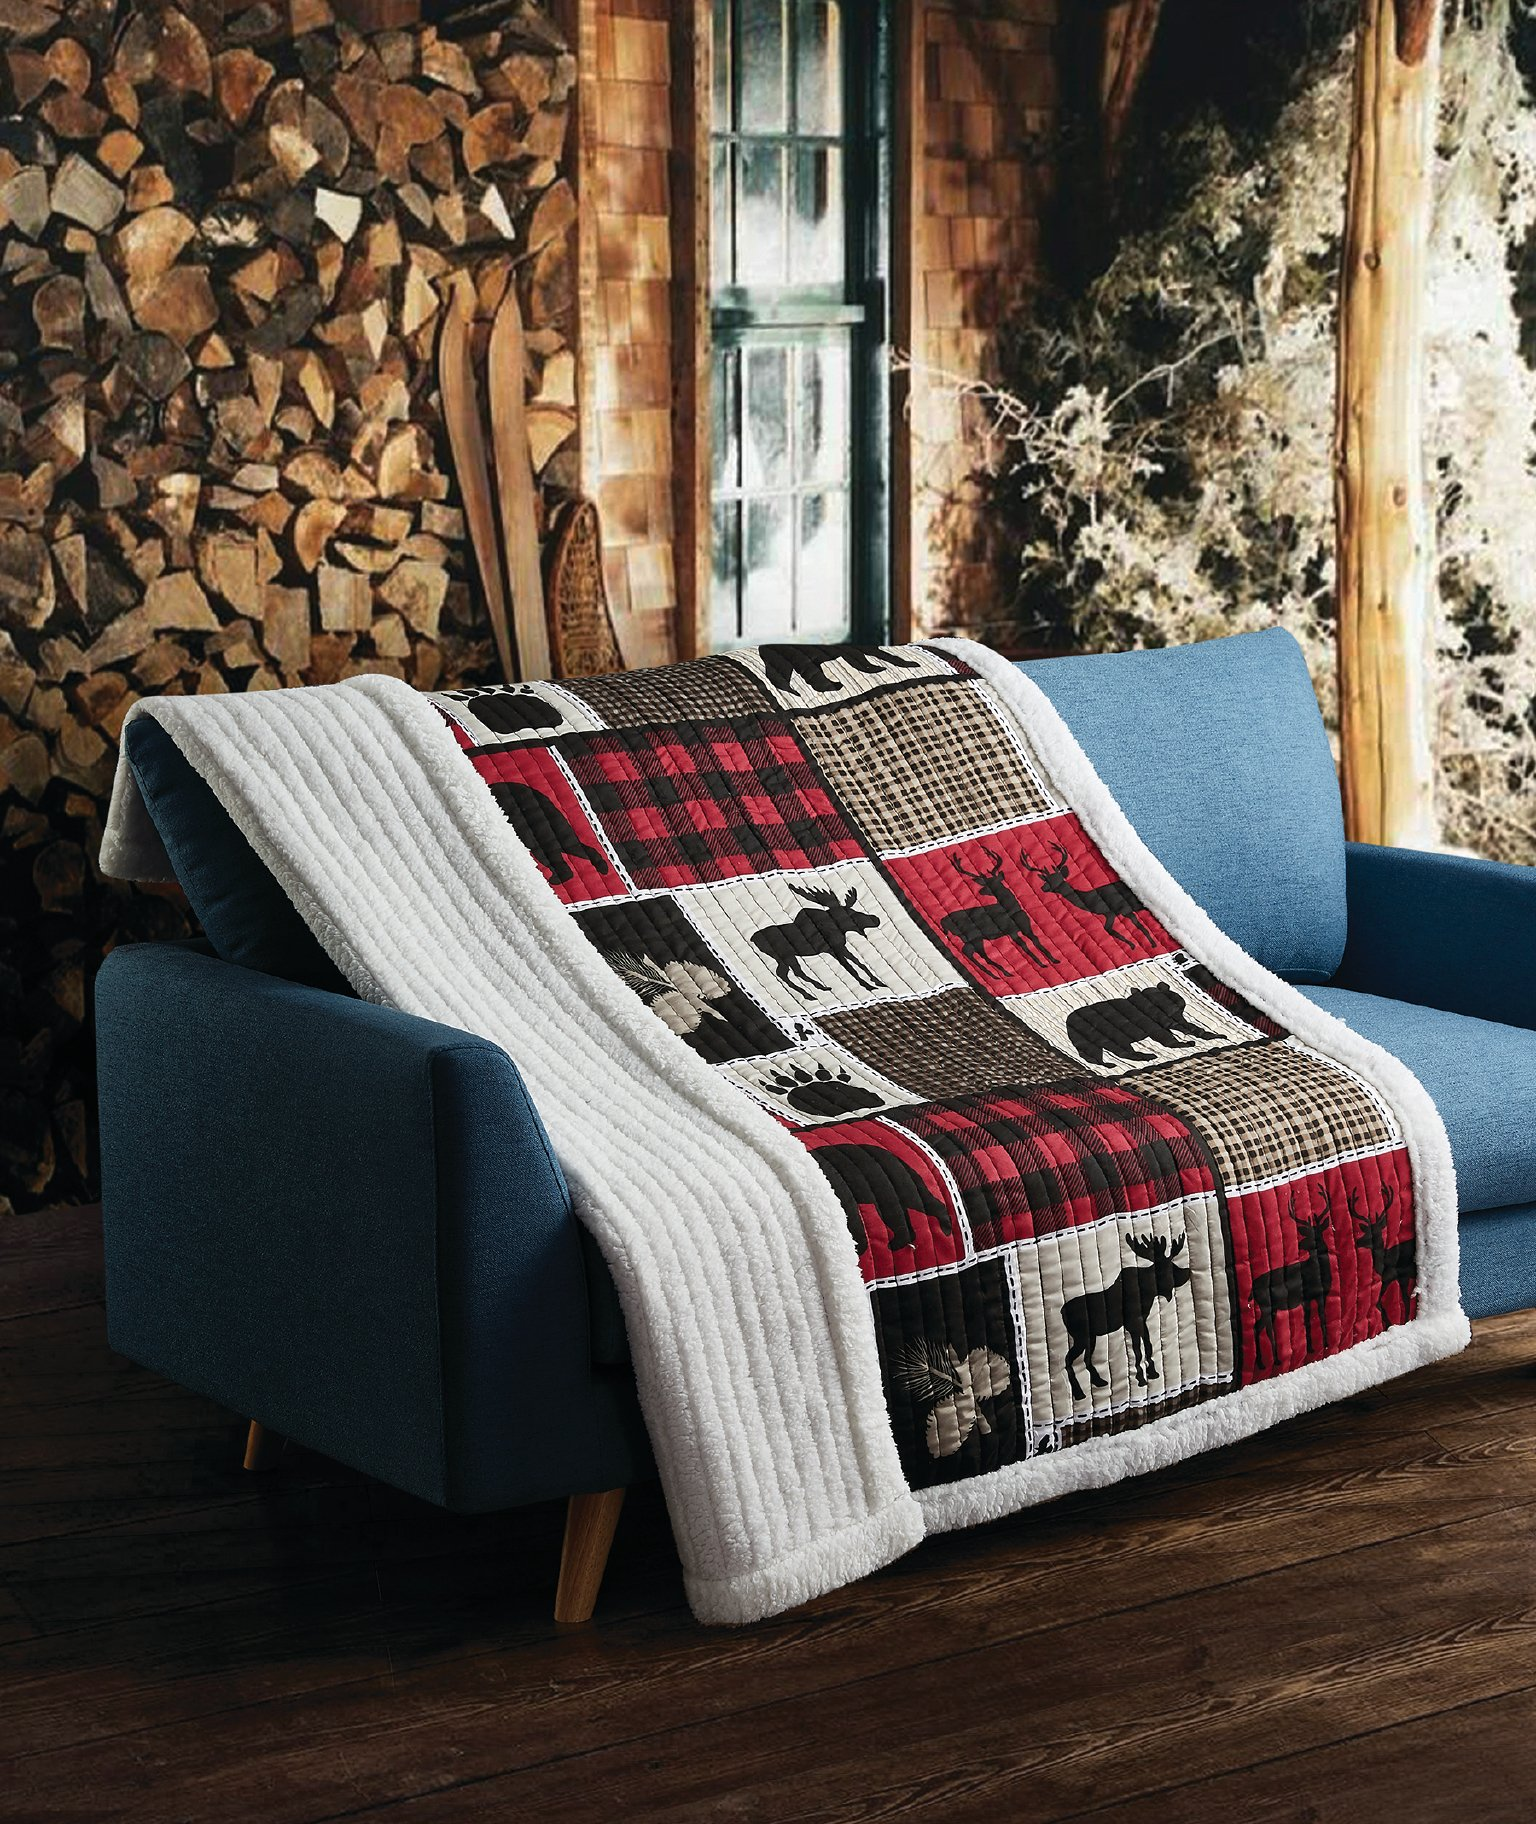 Virah Bella Lodge Life Black Bear Plaid Moose Bird and Deer Patchwork Quilt Throw Sherpa Blanket